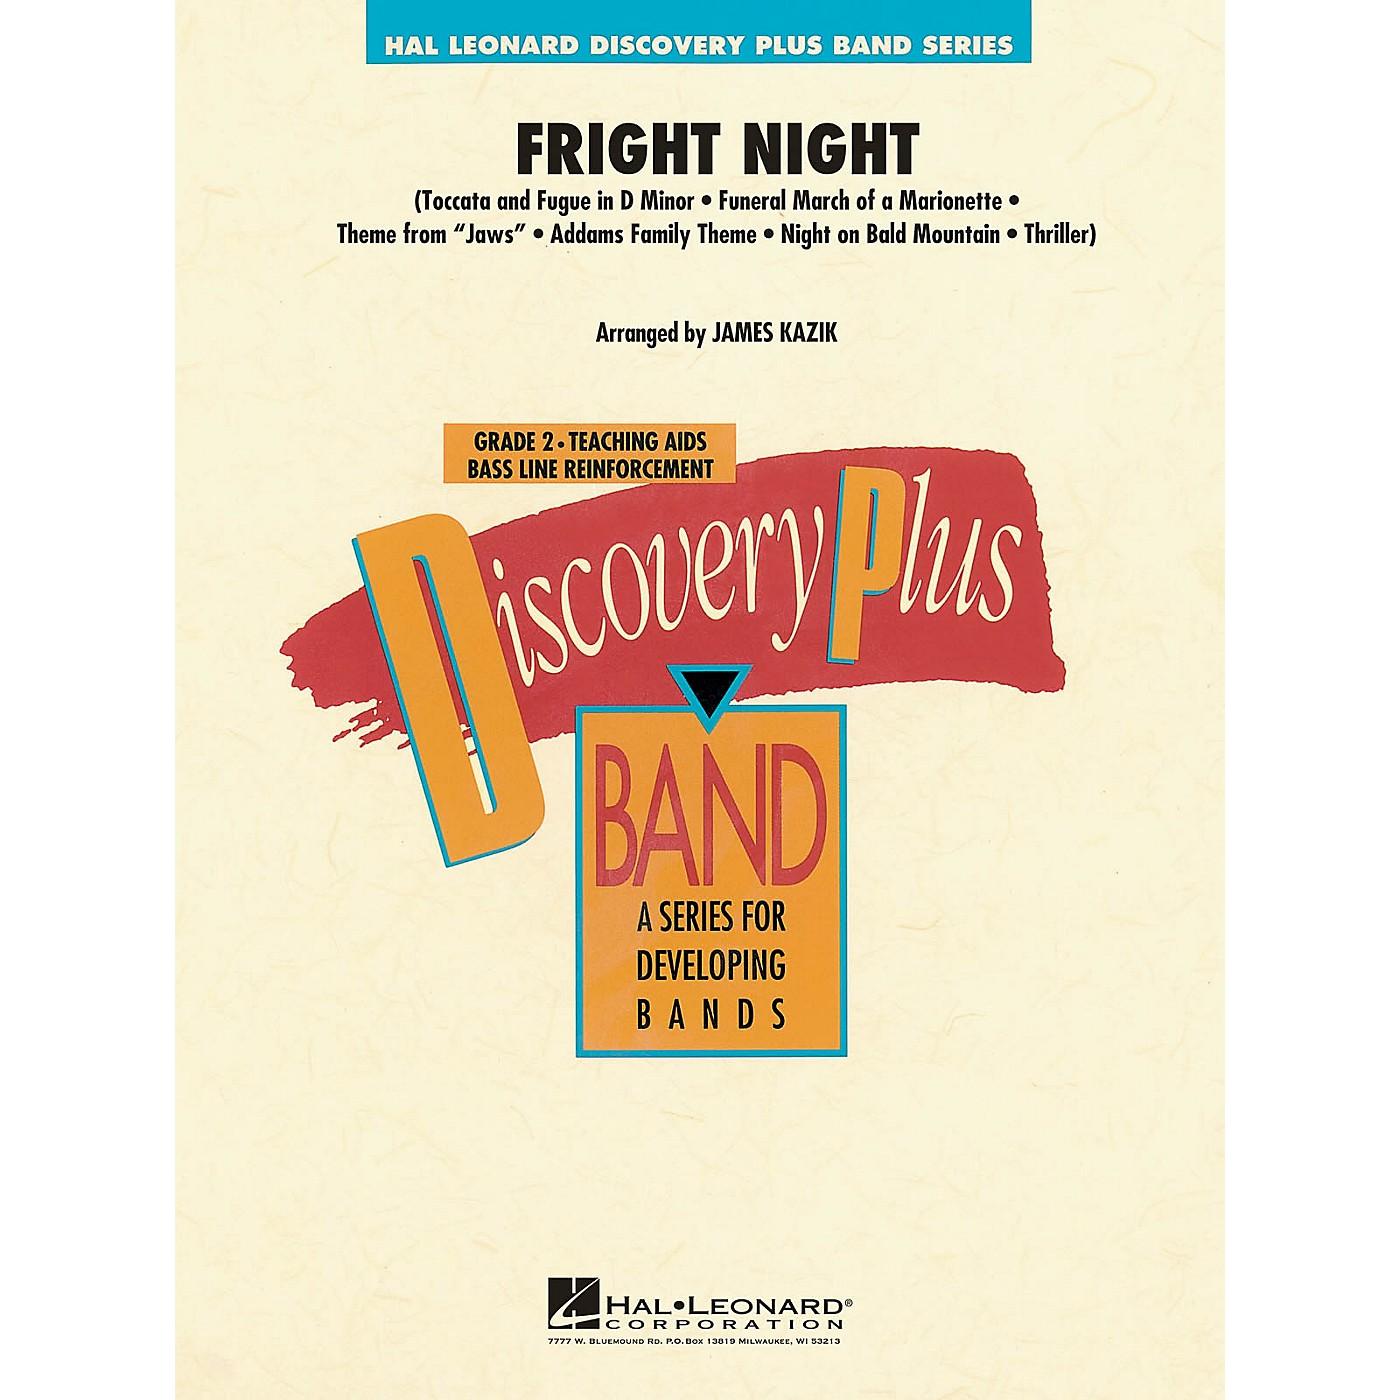 Hal Leonard Fright Night - Discovery Plus Band Level 2 arranged by James Kazik thumbnail